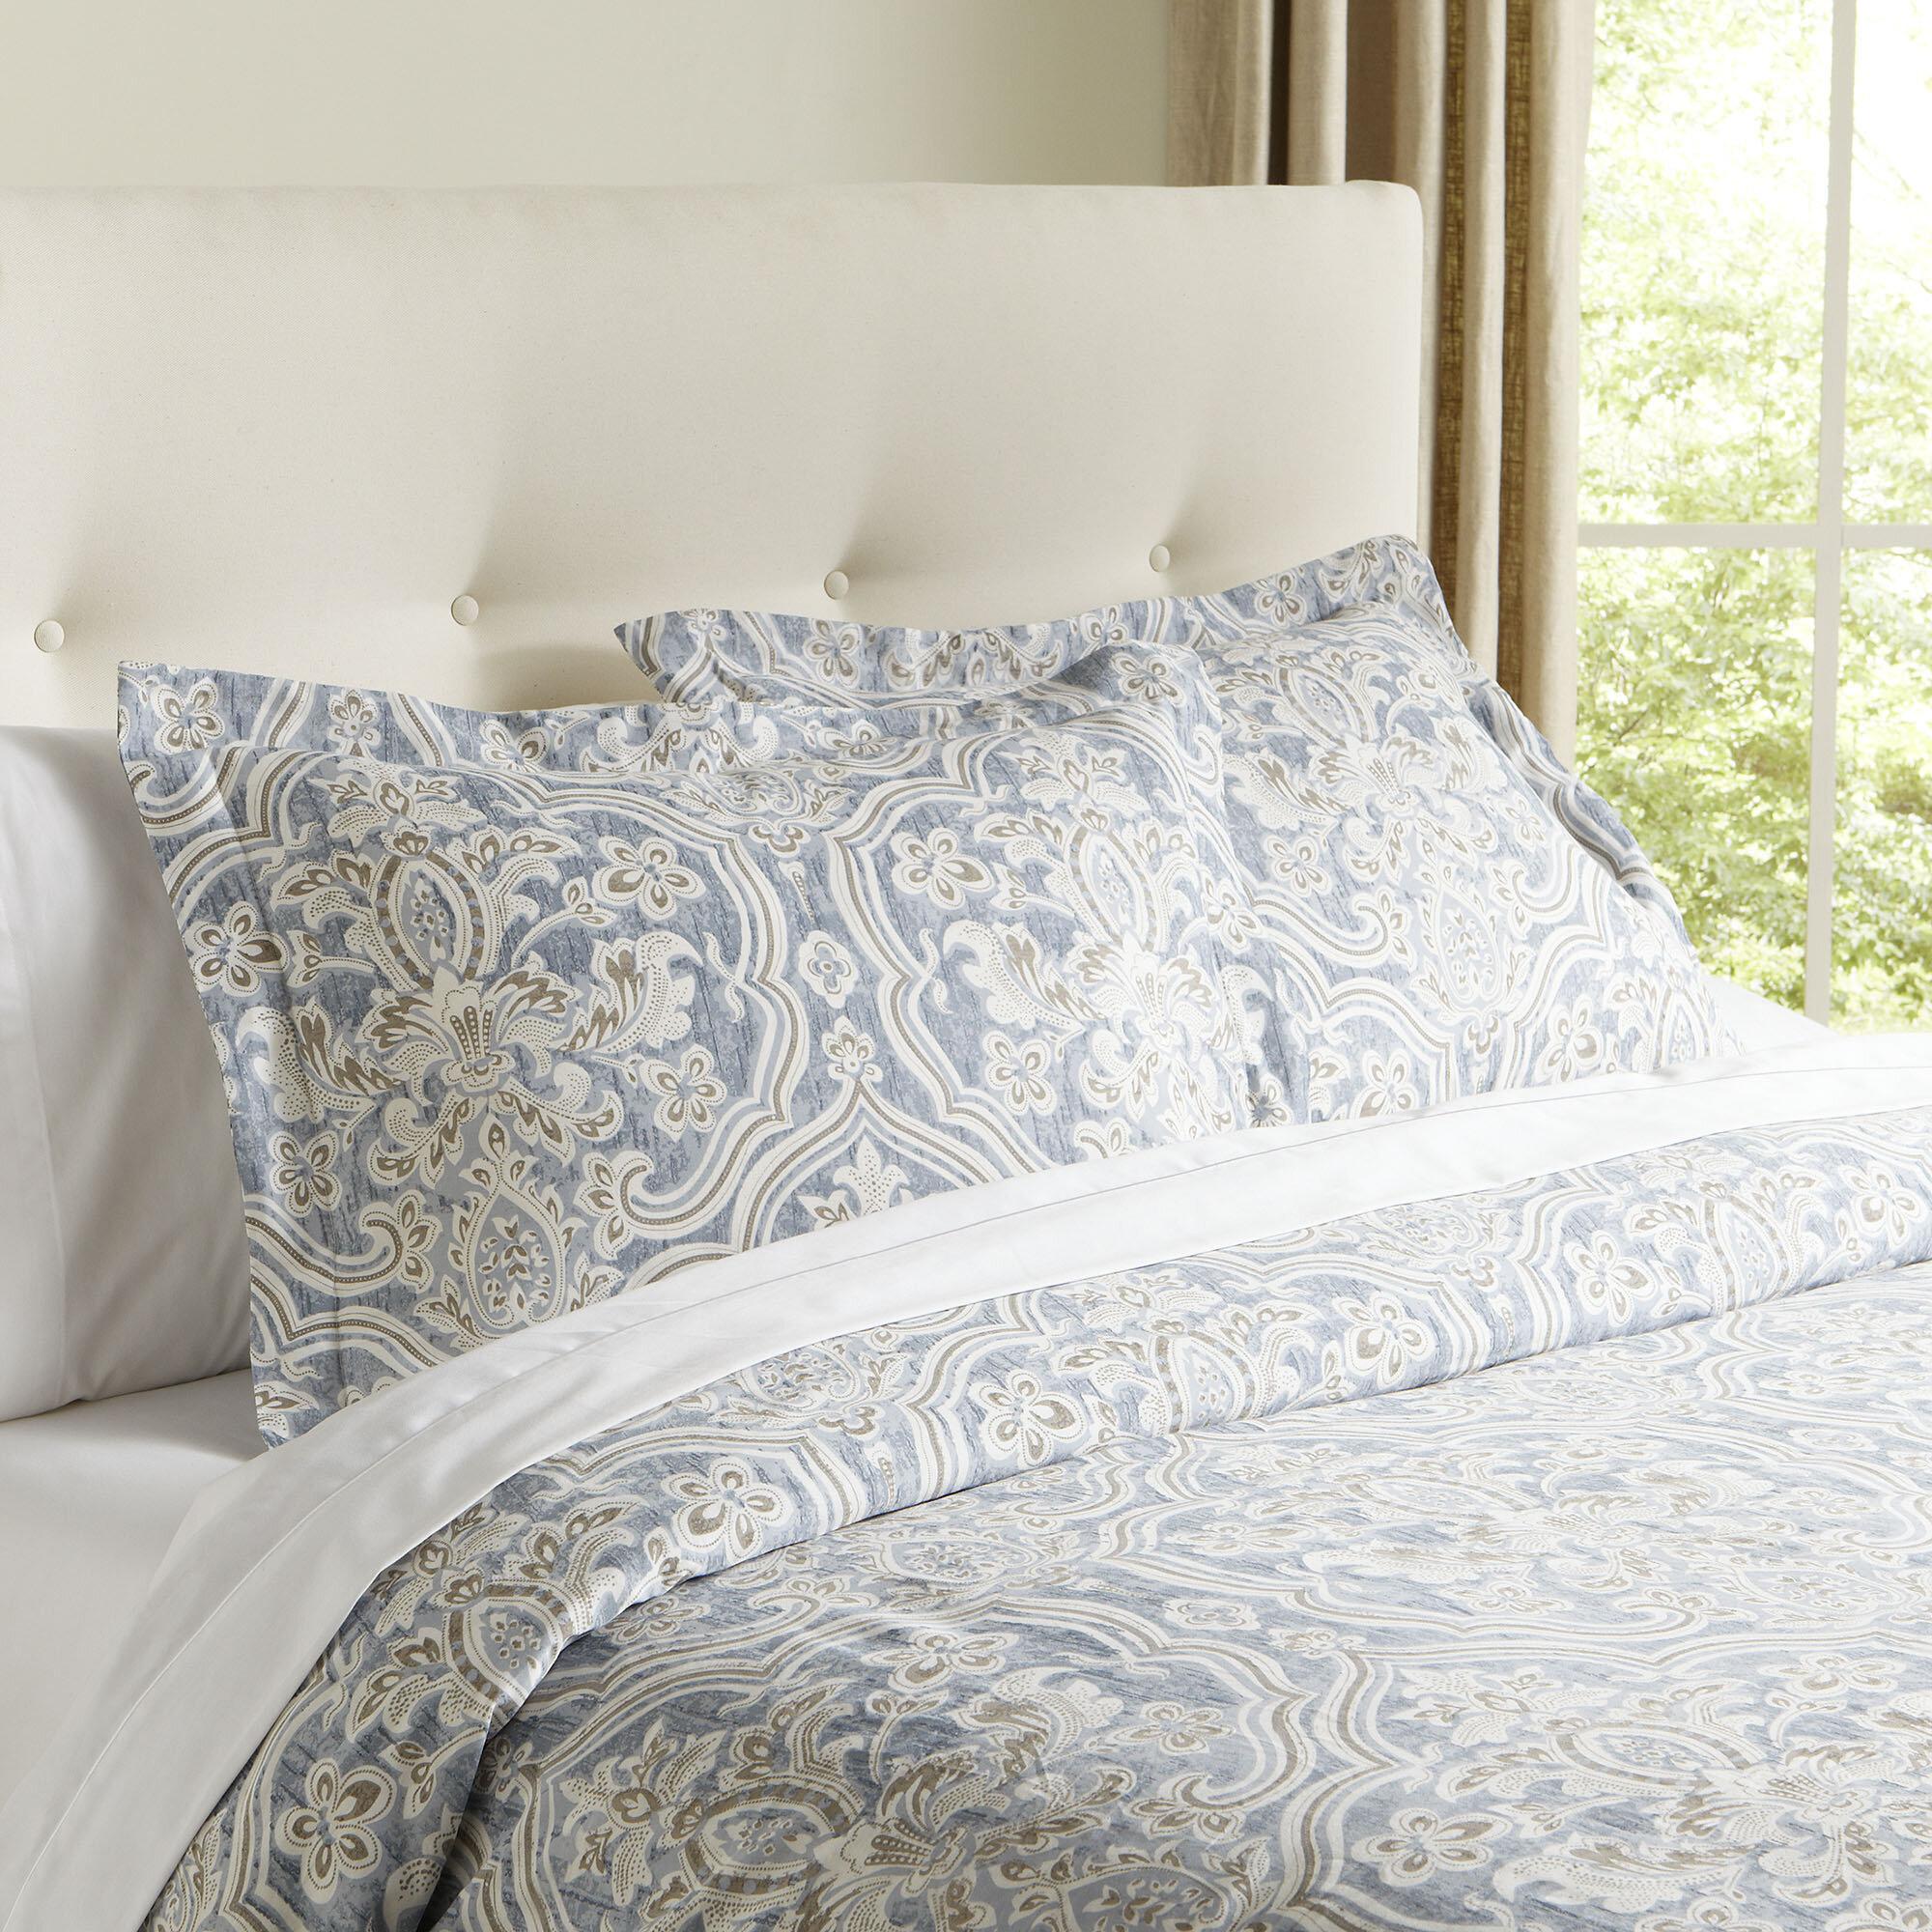 covers bedding rails main sets matalan single comforter duvet bedroom cover double homeware jacquard ixlib king geometric